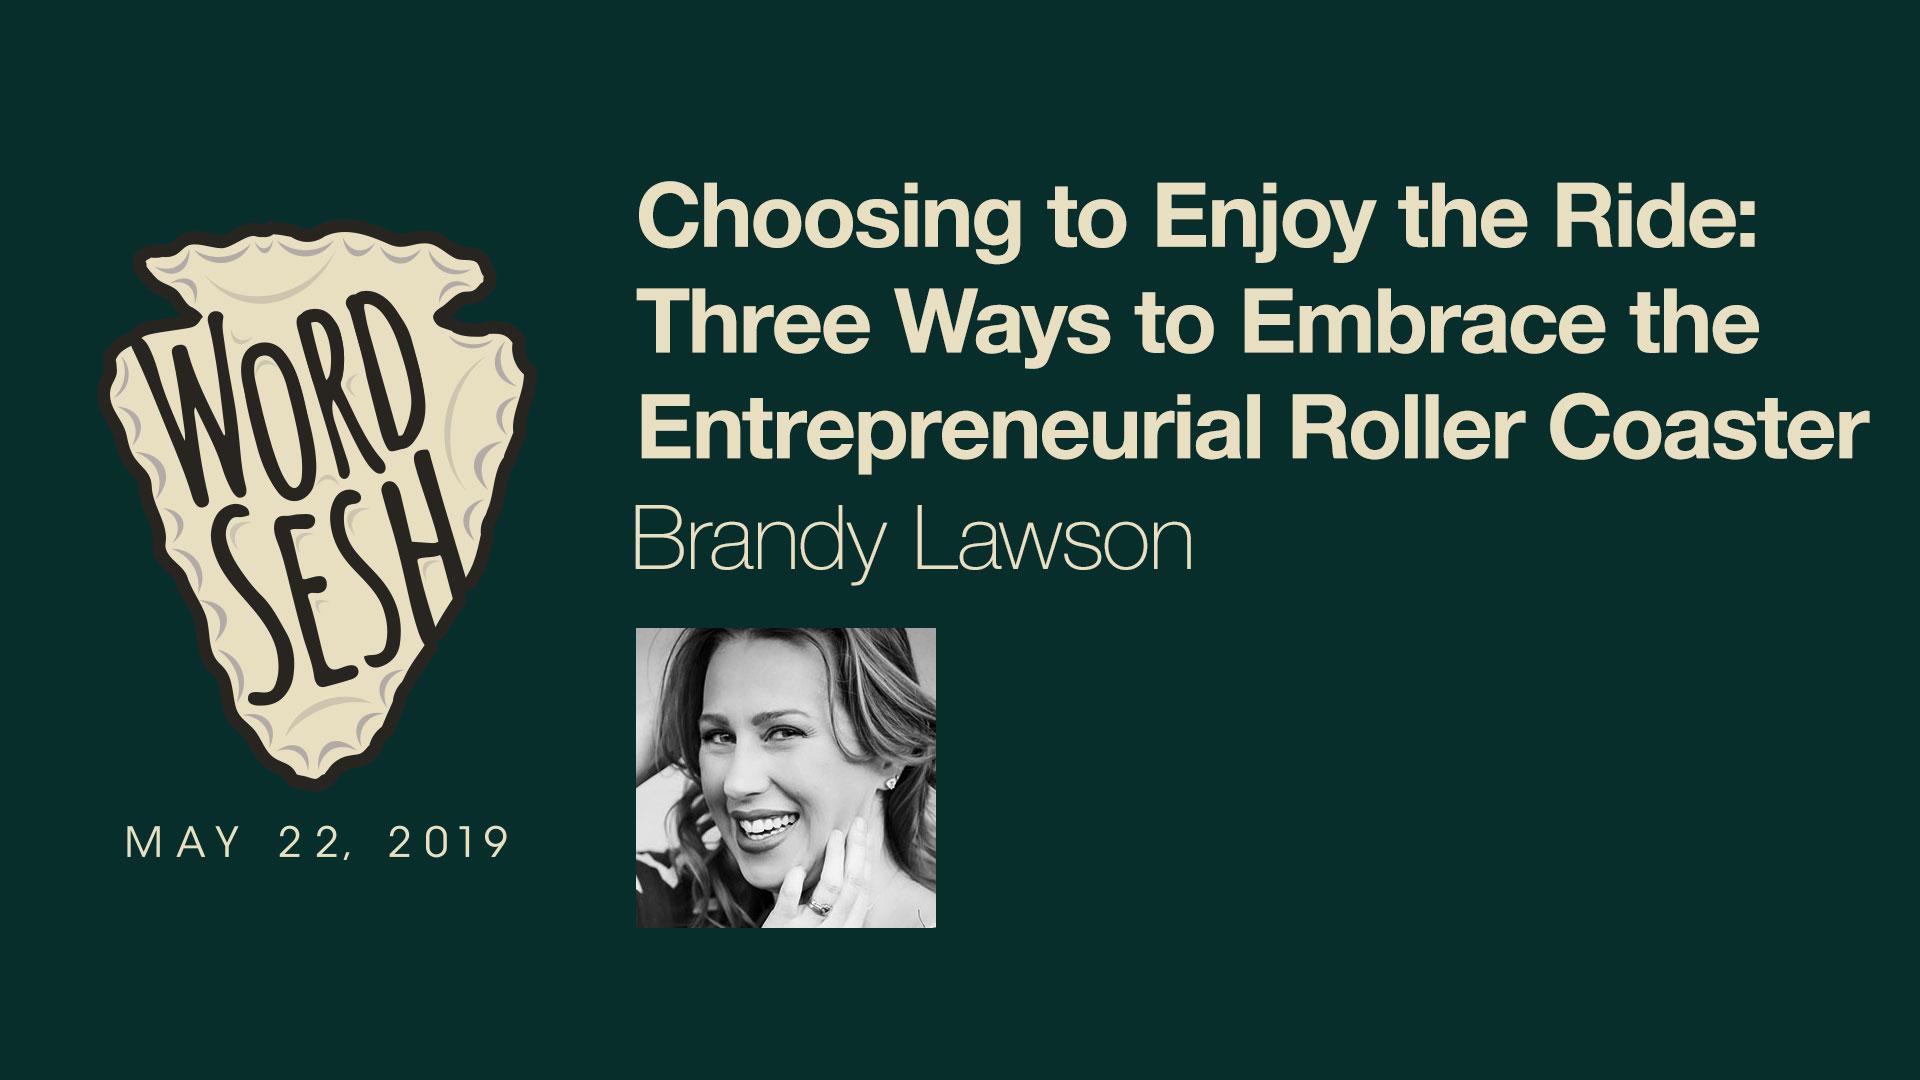 00-01-WordSesh-Entrepreneurial-Roller-Coaster-Brandy-Lawson